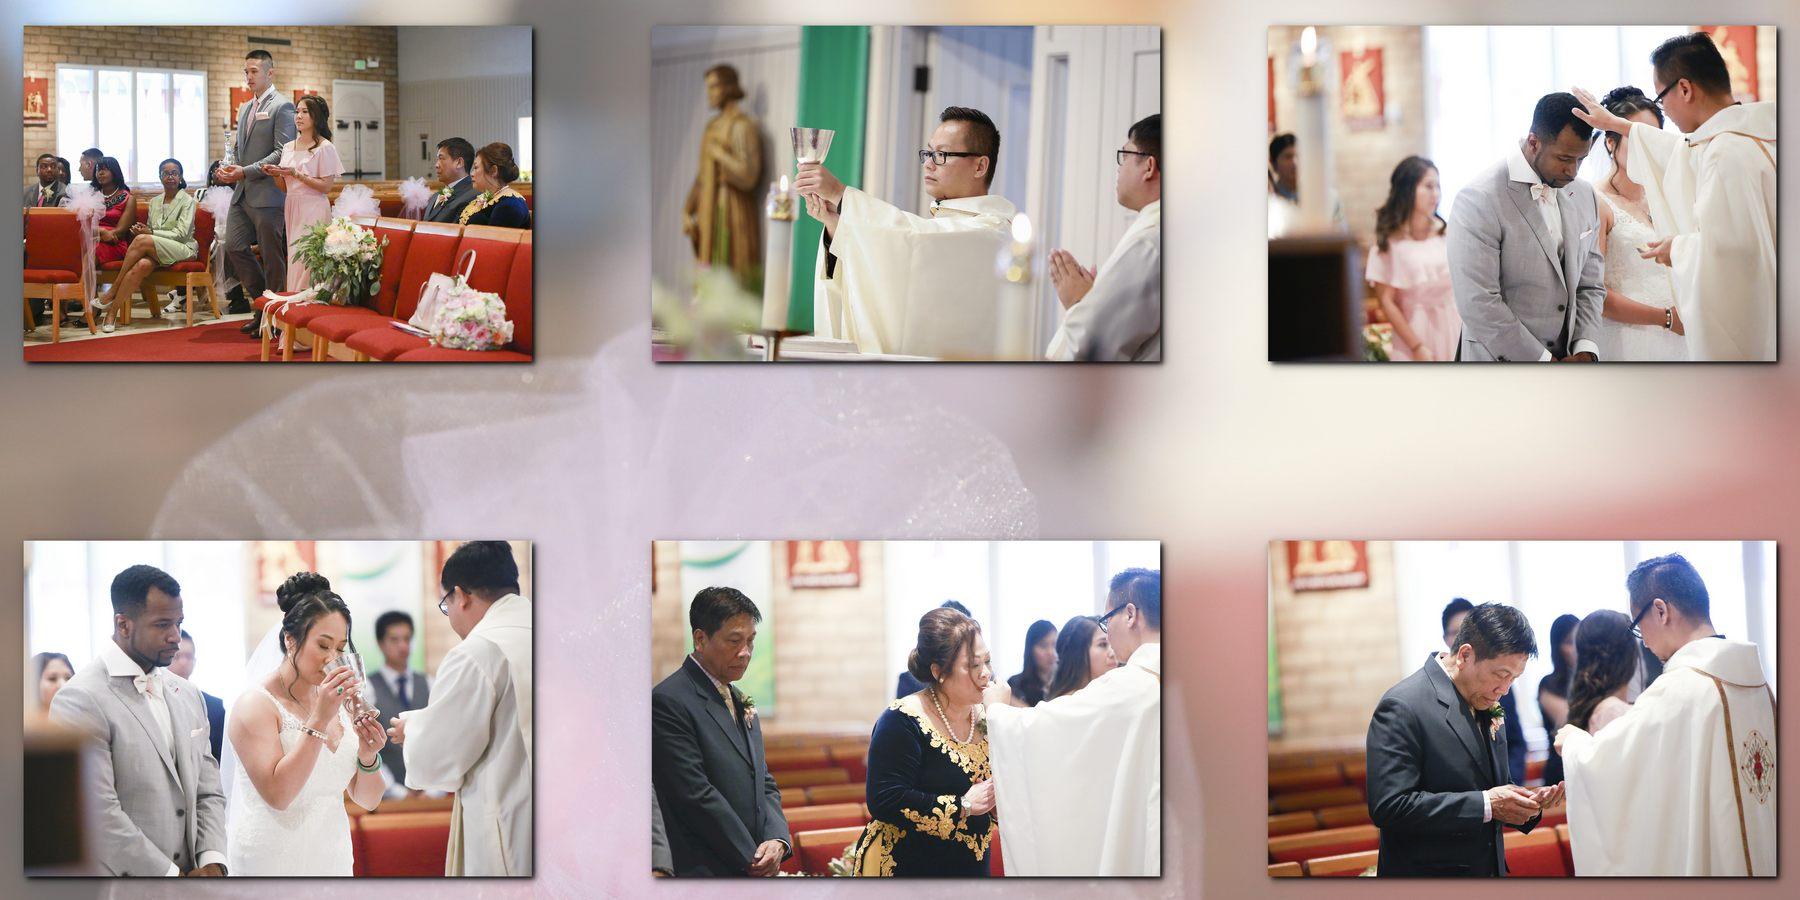 Keneisha wedding album 008 (Sides 14-15)